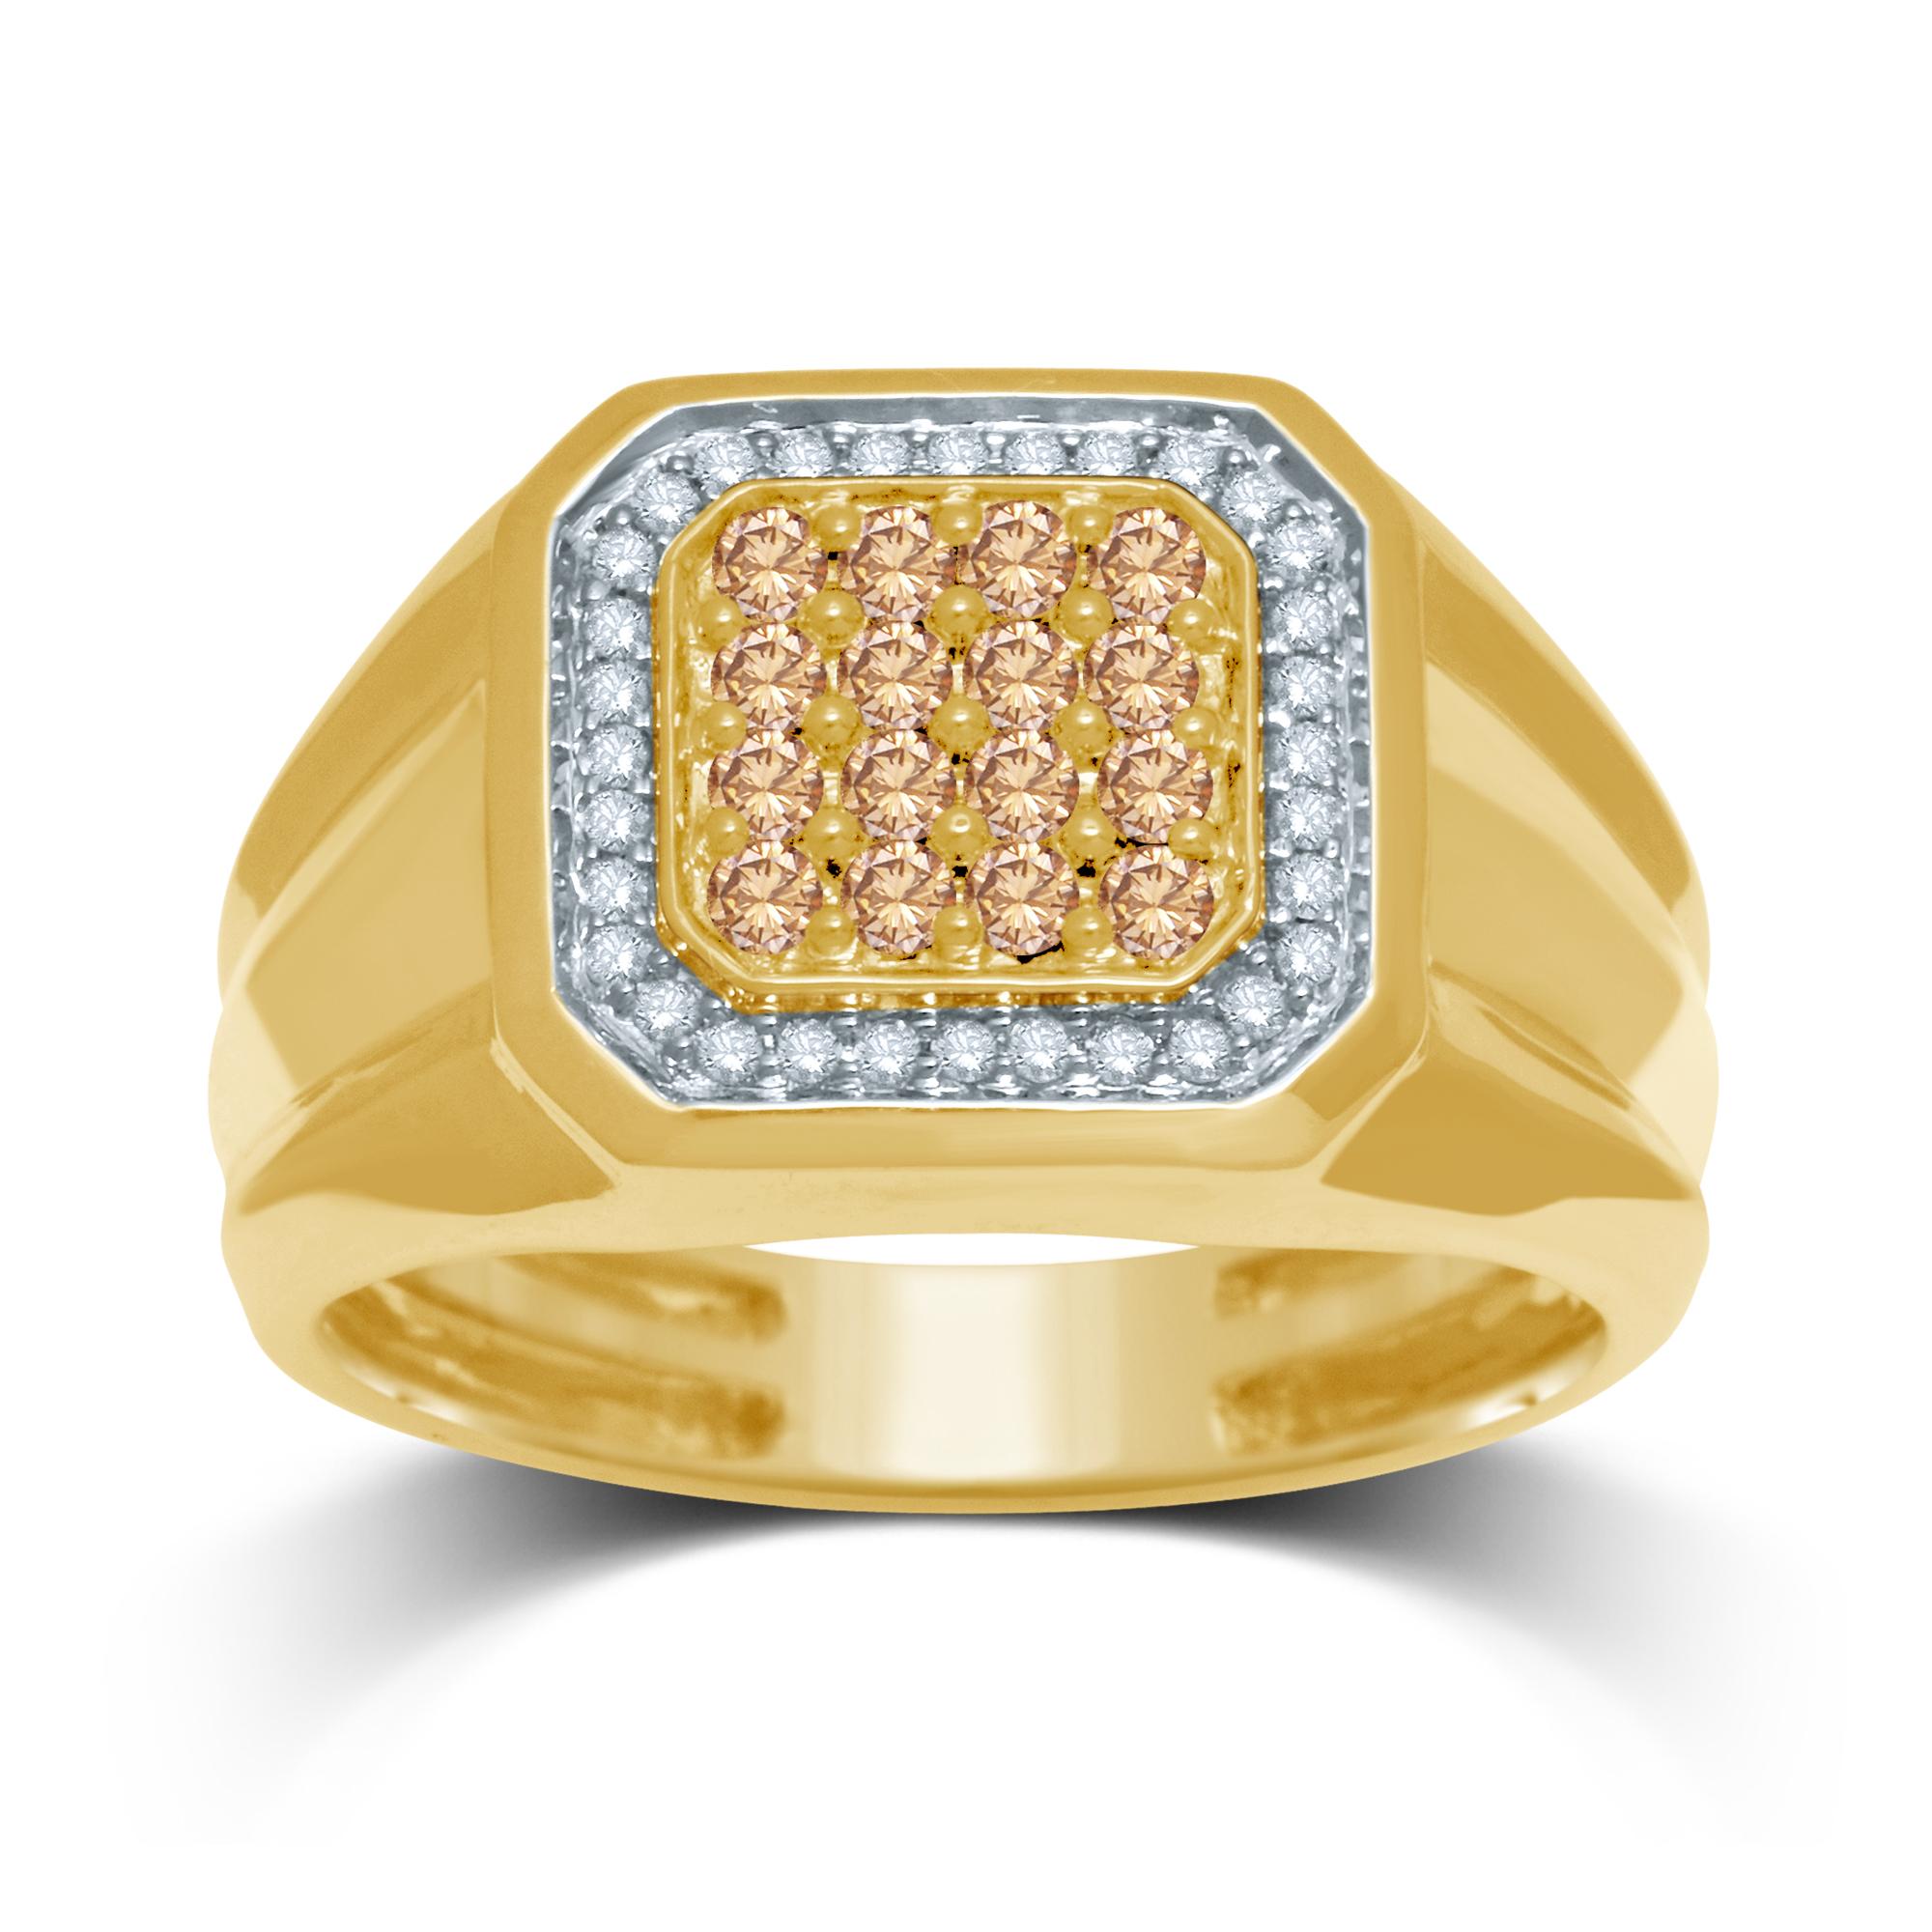 Australian Diamond 9ct Yellow Gold Gents Ring with 1/2 Carat of Diamonds